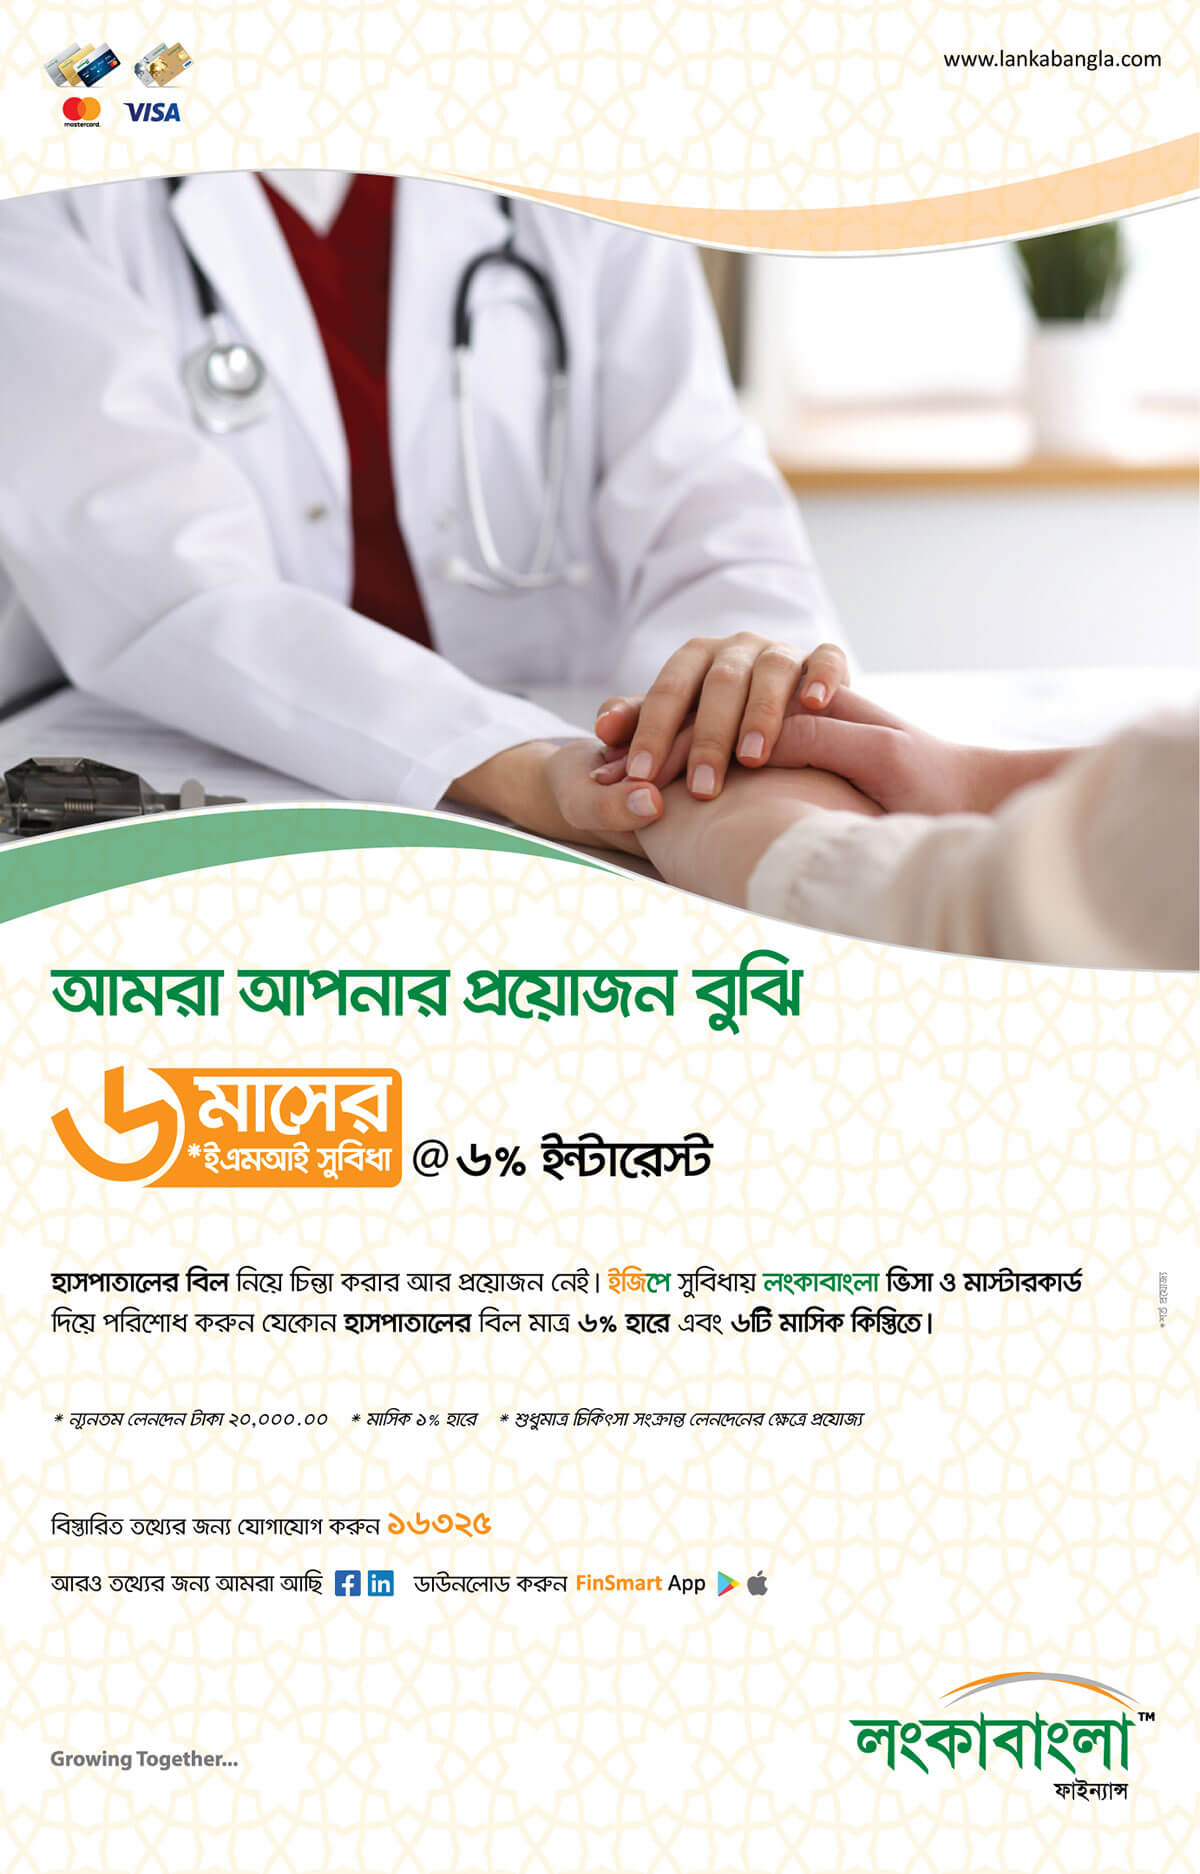 Cards - LankaBangla Finance Limited